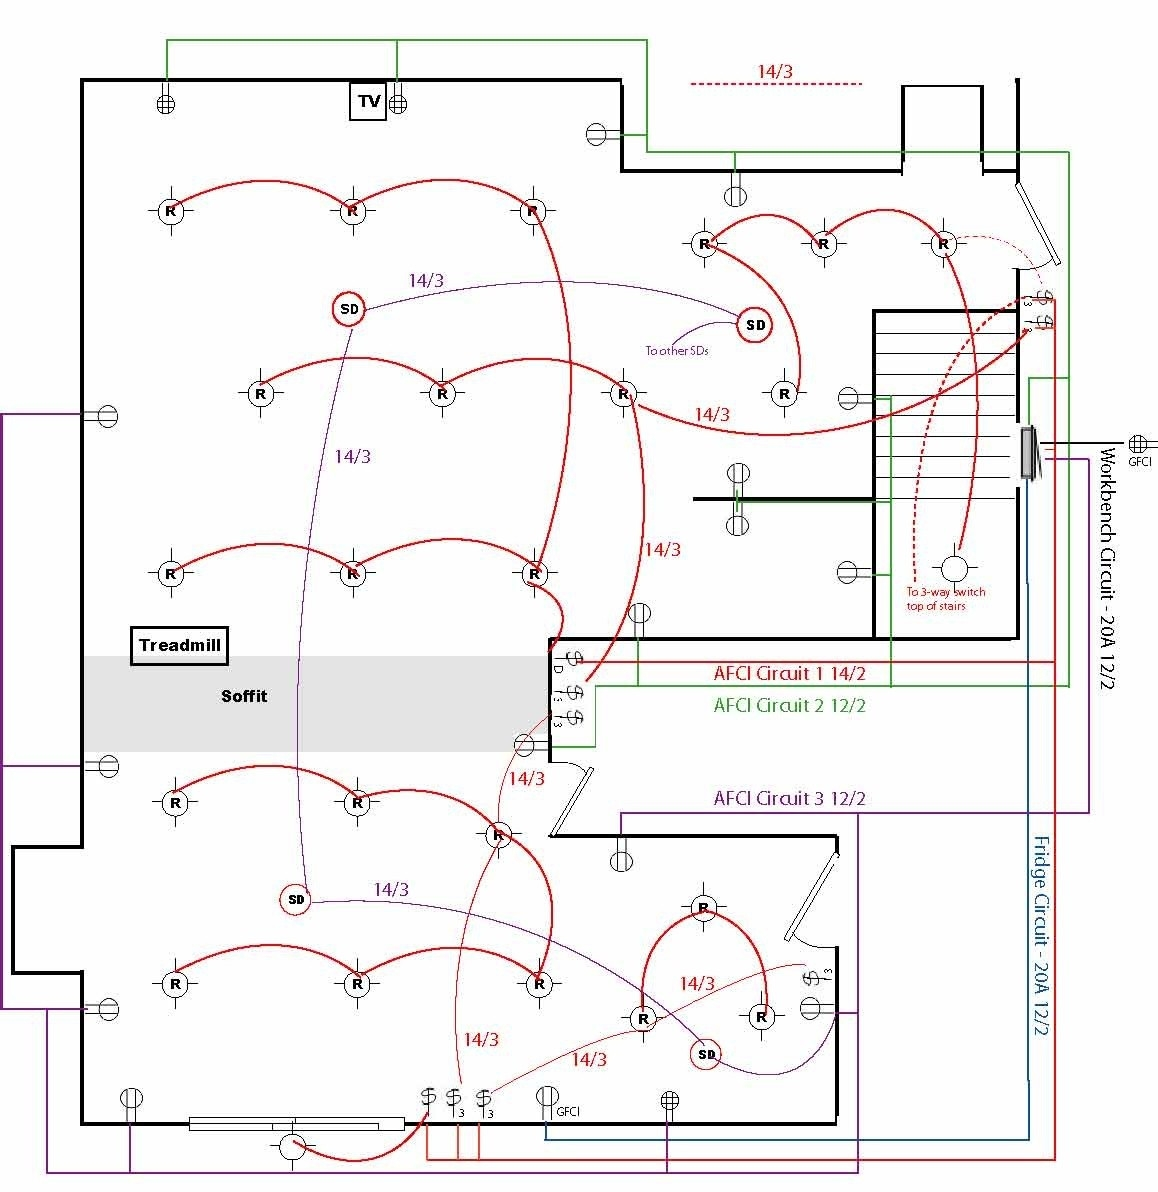 House Wiring Diagram Pdf